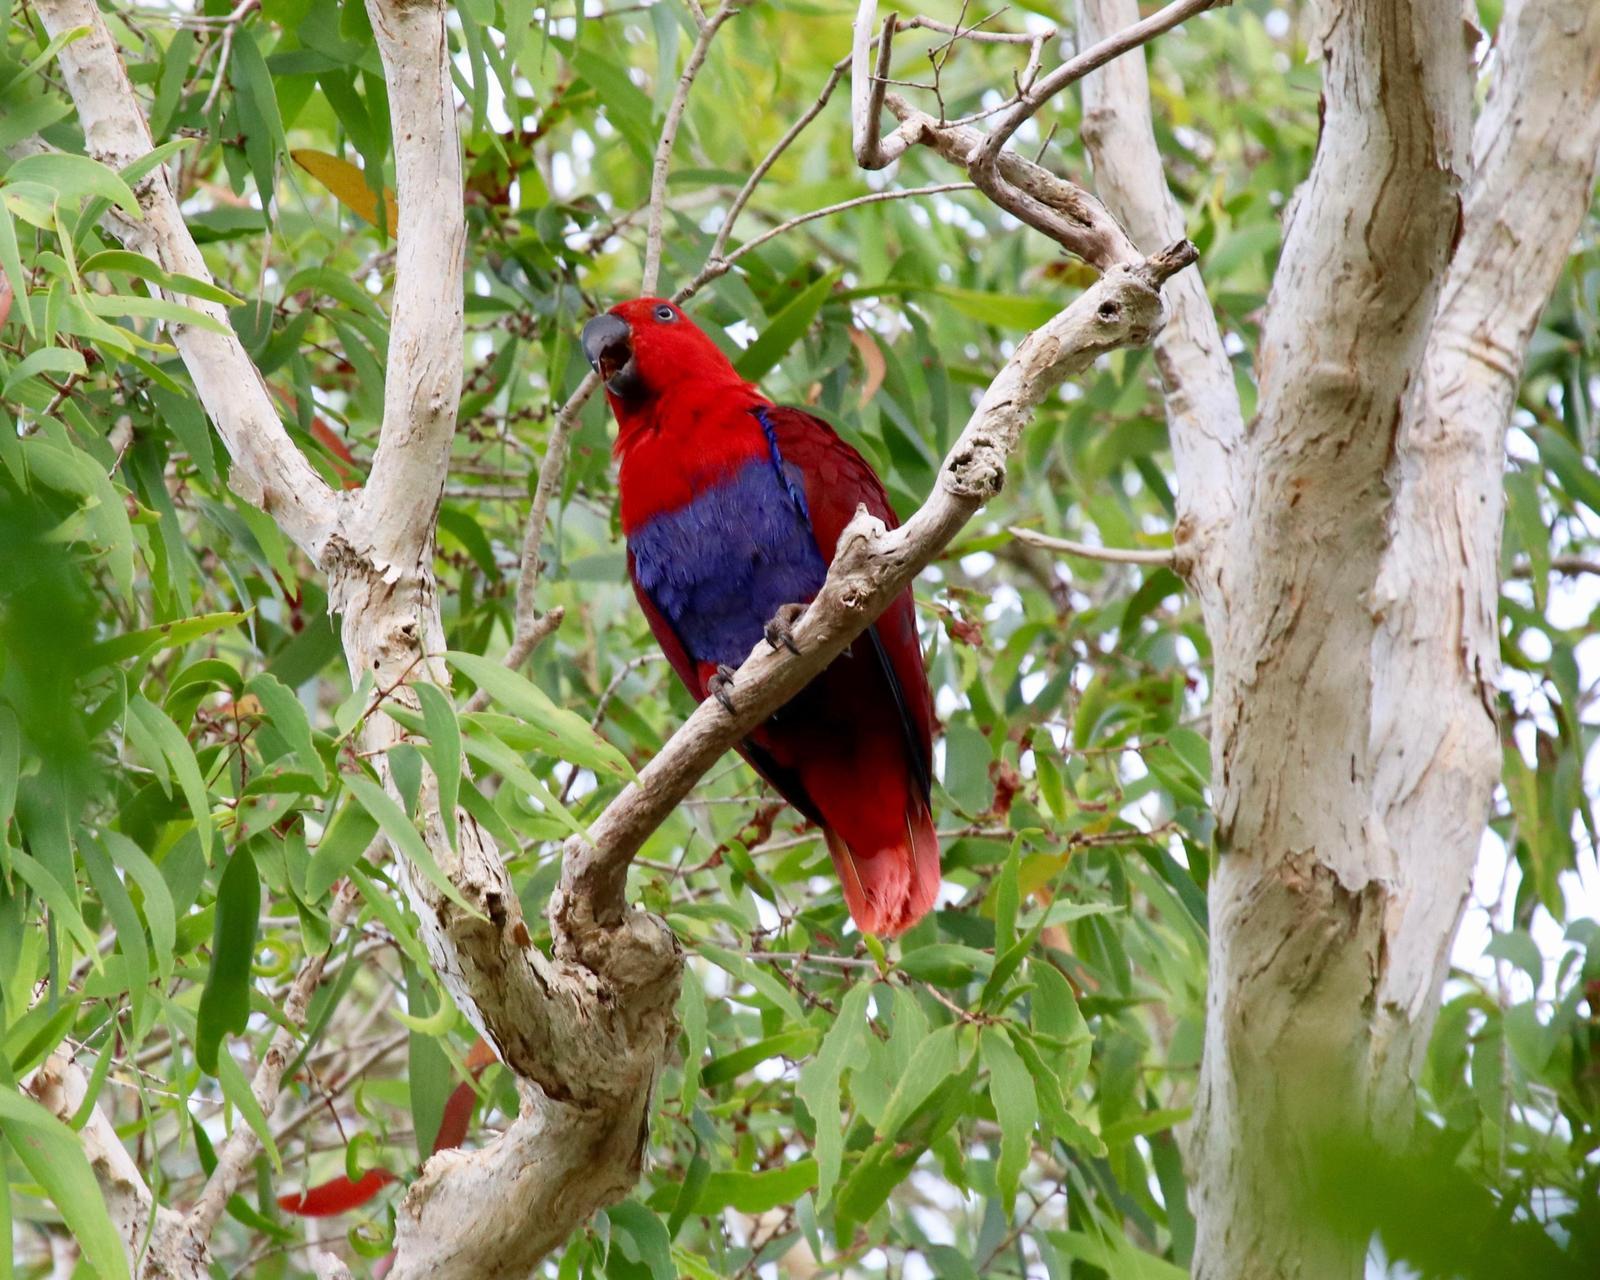 Eclectus Parrot Photo by Daniel Sloan